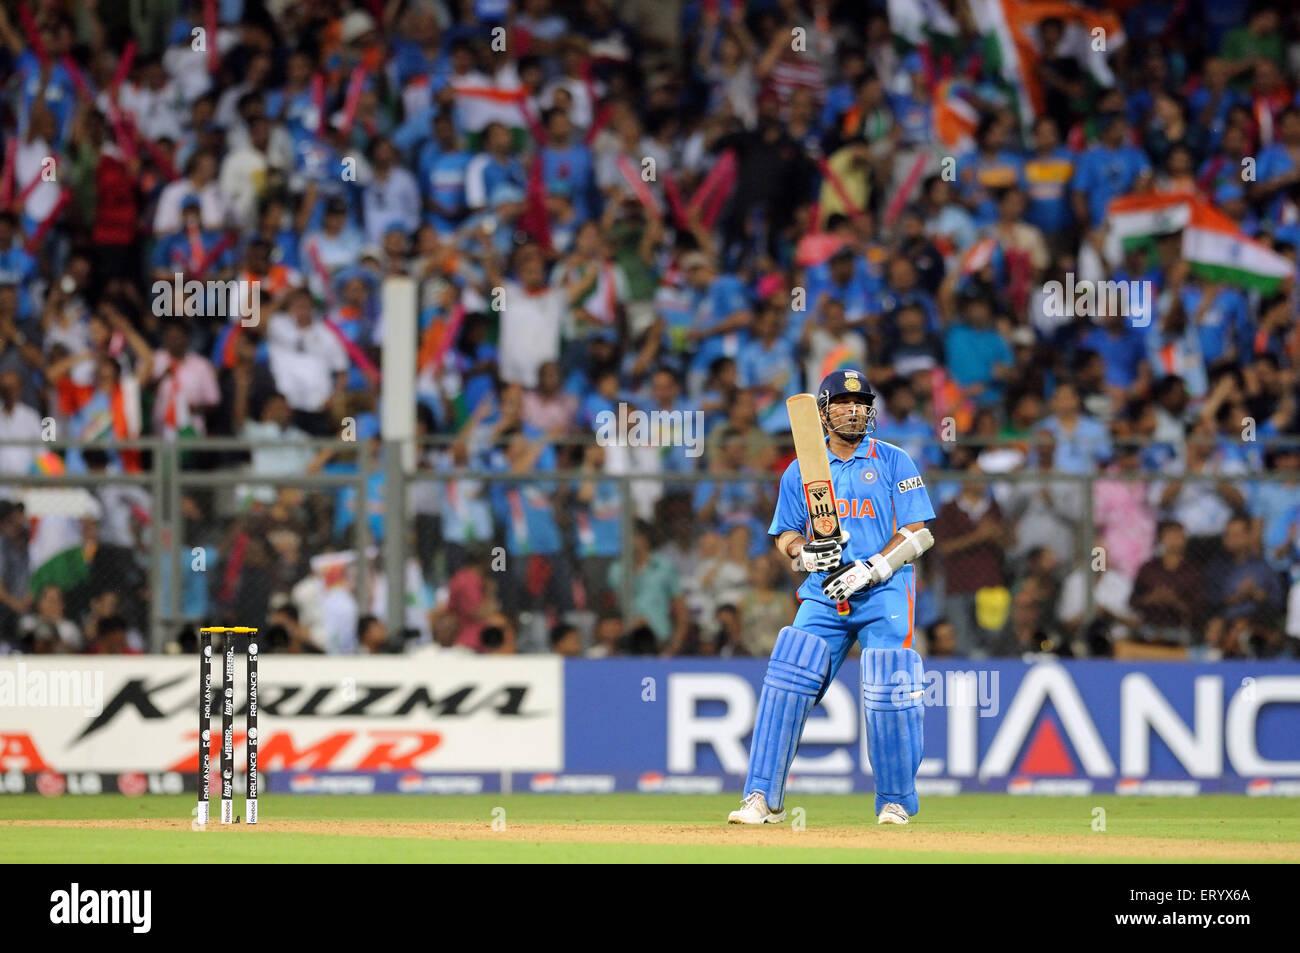 Indian batsman Sachin Tendulkar  2011 ICC World Cup Final Sri Lanka Wankhede Stadium Mumbai - Stock Image